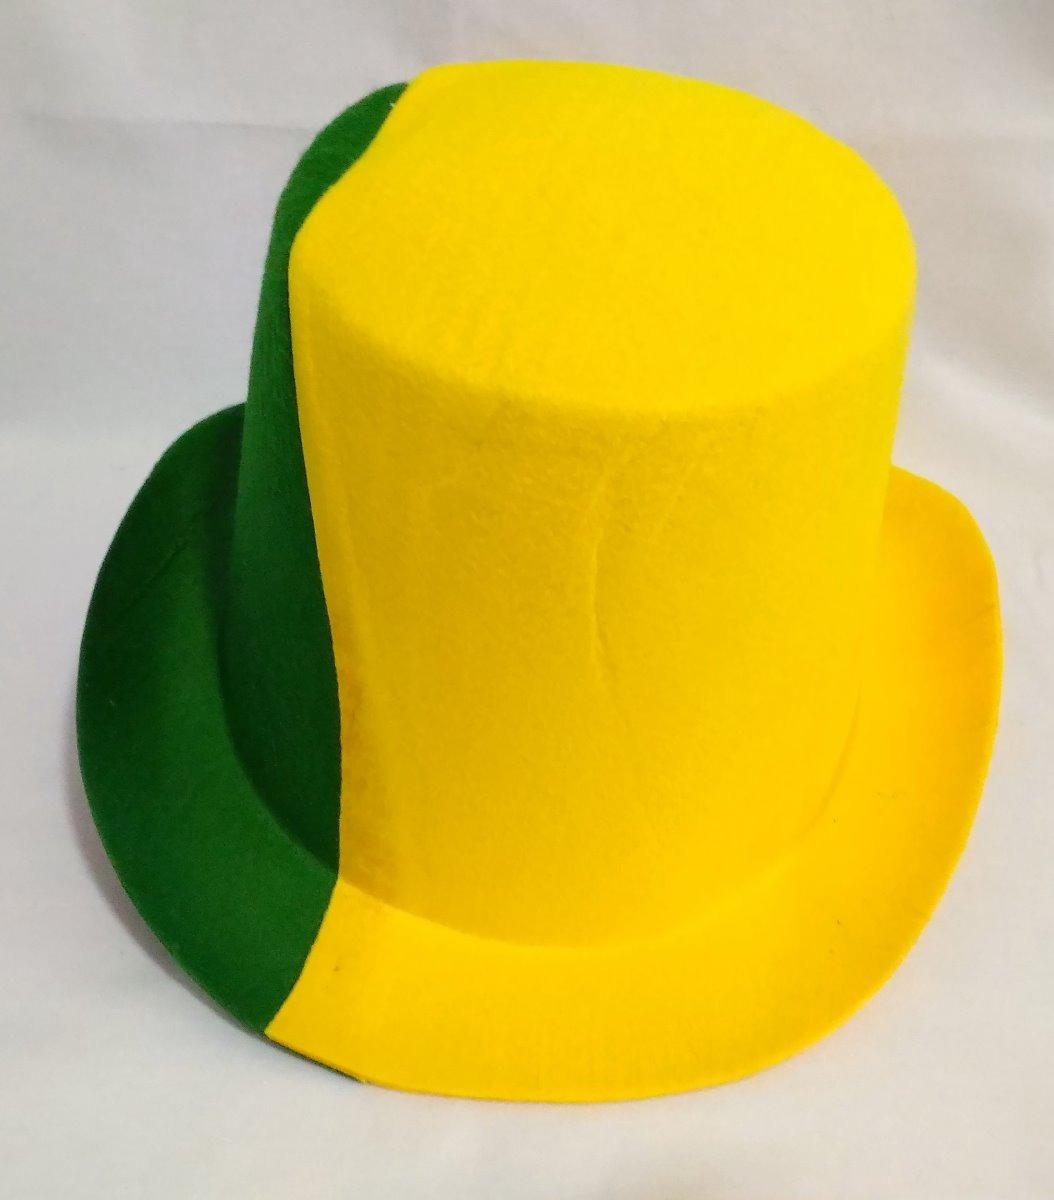 86a054f7414e4 chapéu feltro cartola verde amarelo jogo brasil copa torcida. Carregando  zoom.